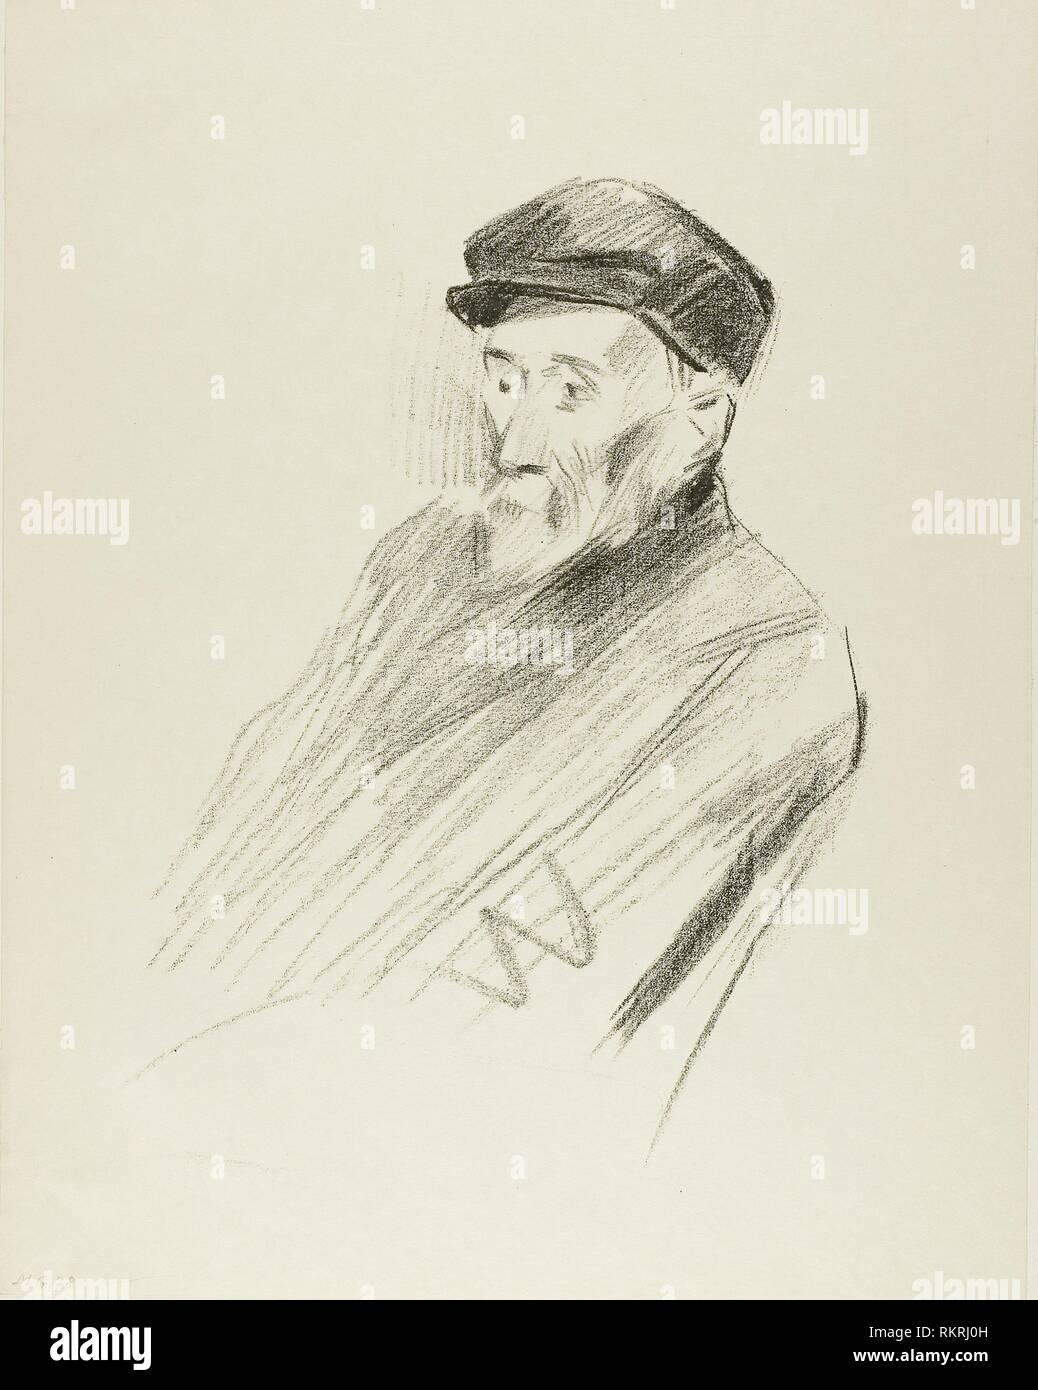 Portrait of Renoir, Third Plate - 1905 - Jean Louis Forain French, 1852-1931 - Artist: Jean Louis Forain, Origin: France, Date: 1905, Medium: - Stock Image